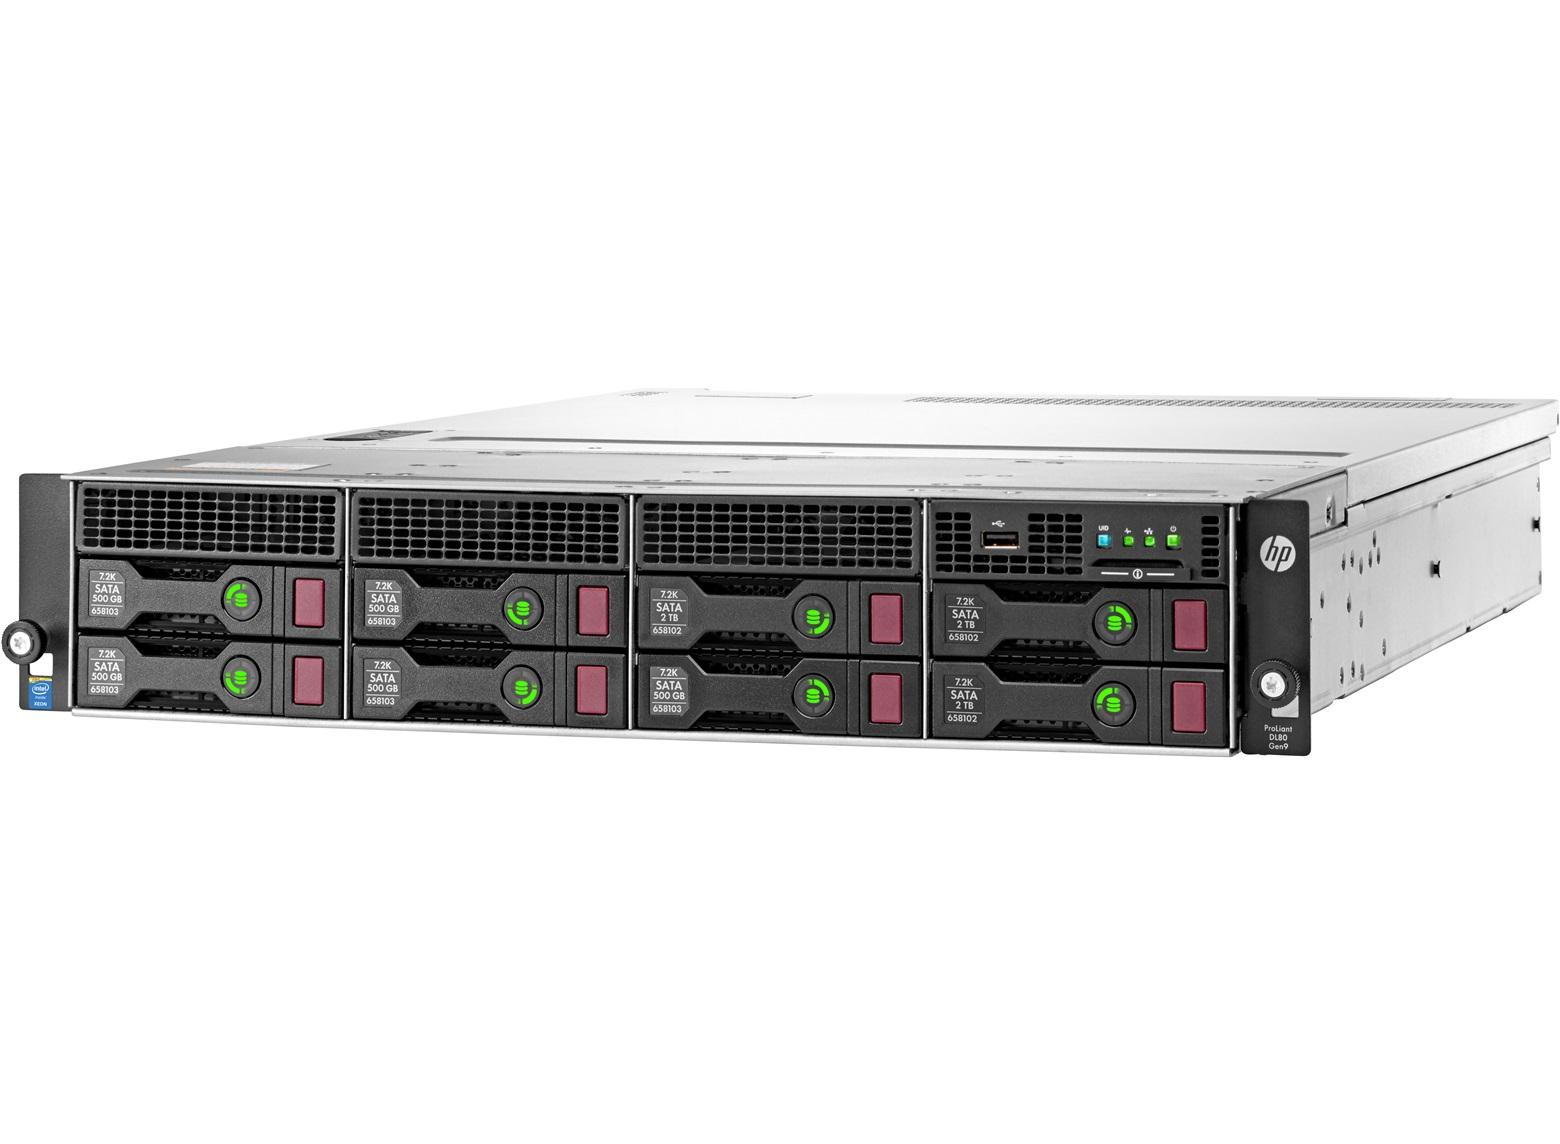 HP DL80 Gen9 E5-2603v3, 8GB, P840/4GB, 12 x LFF